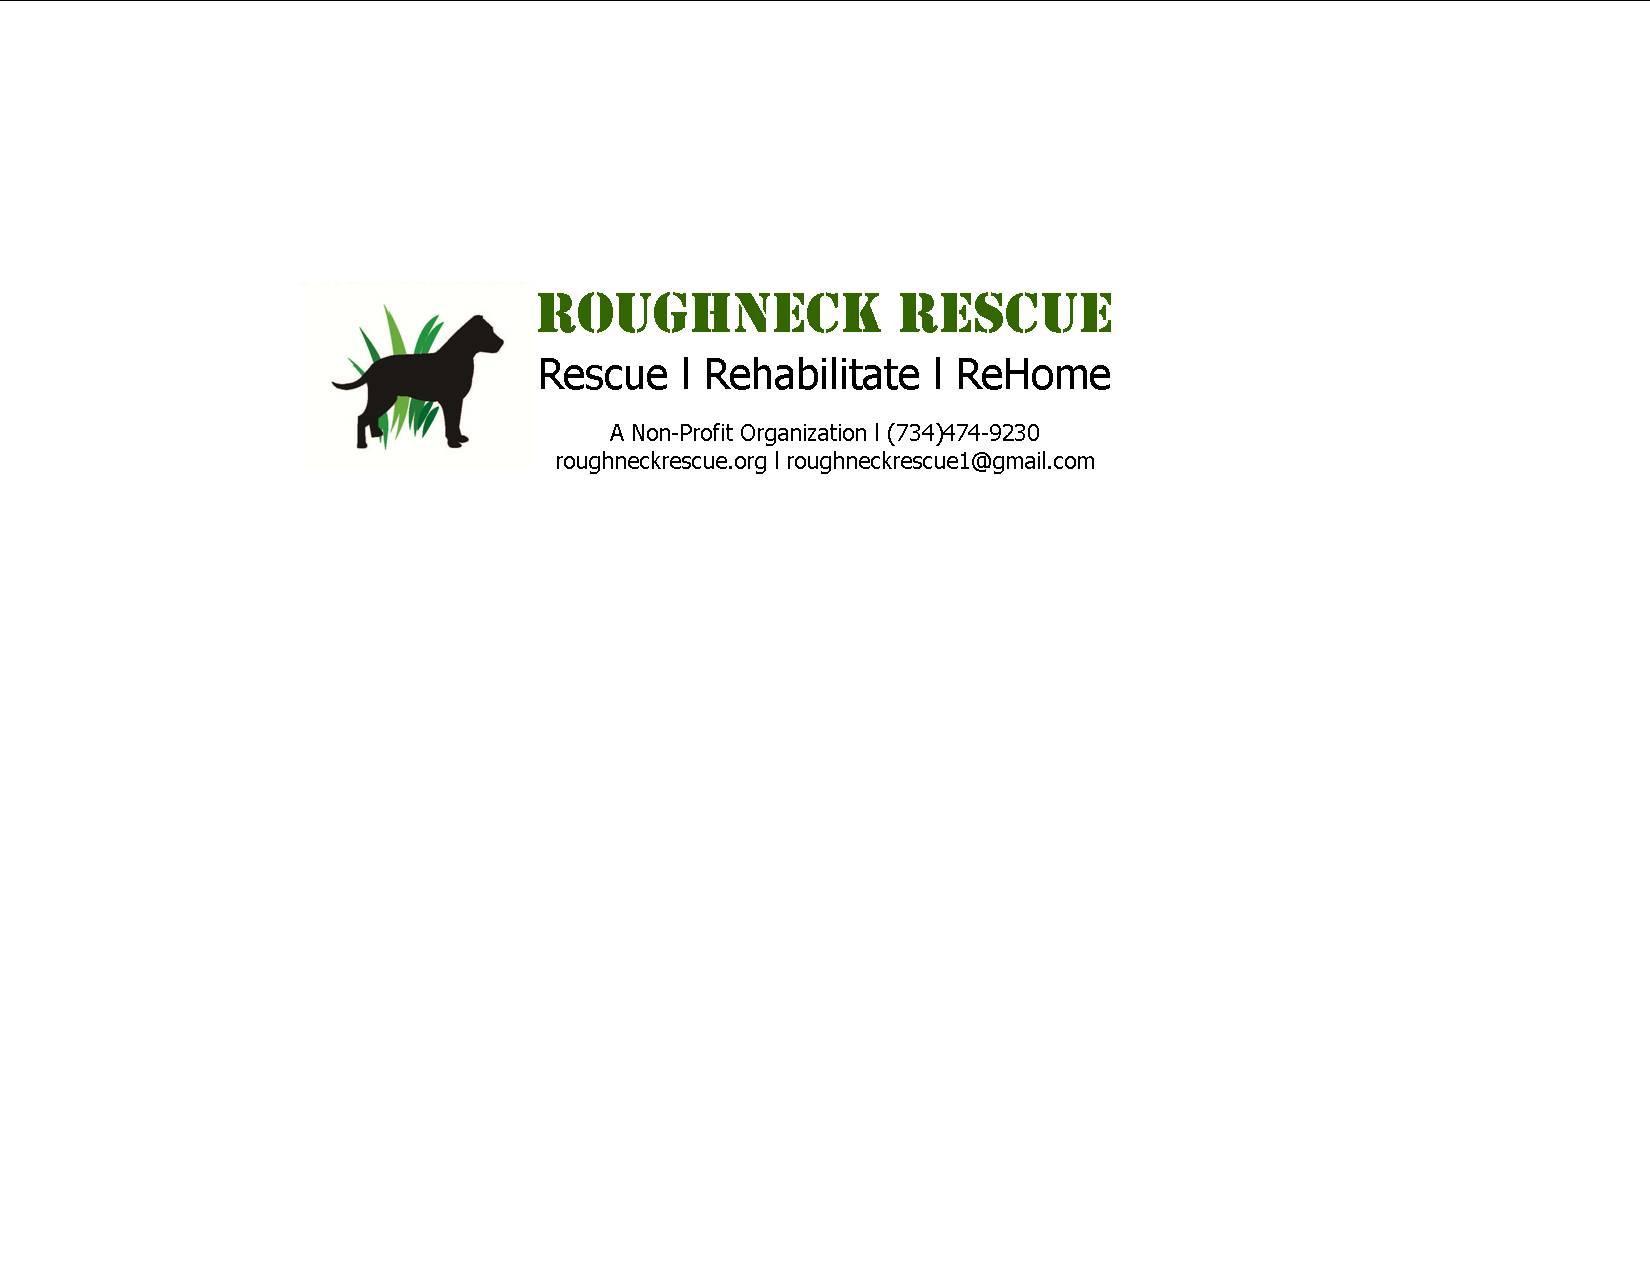 Roughneck Rescue